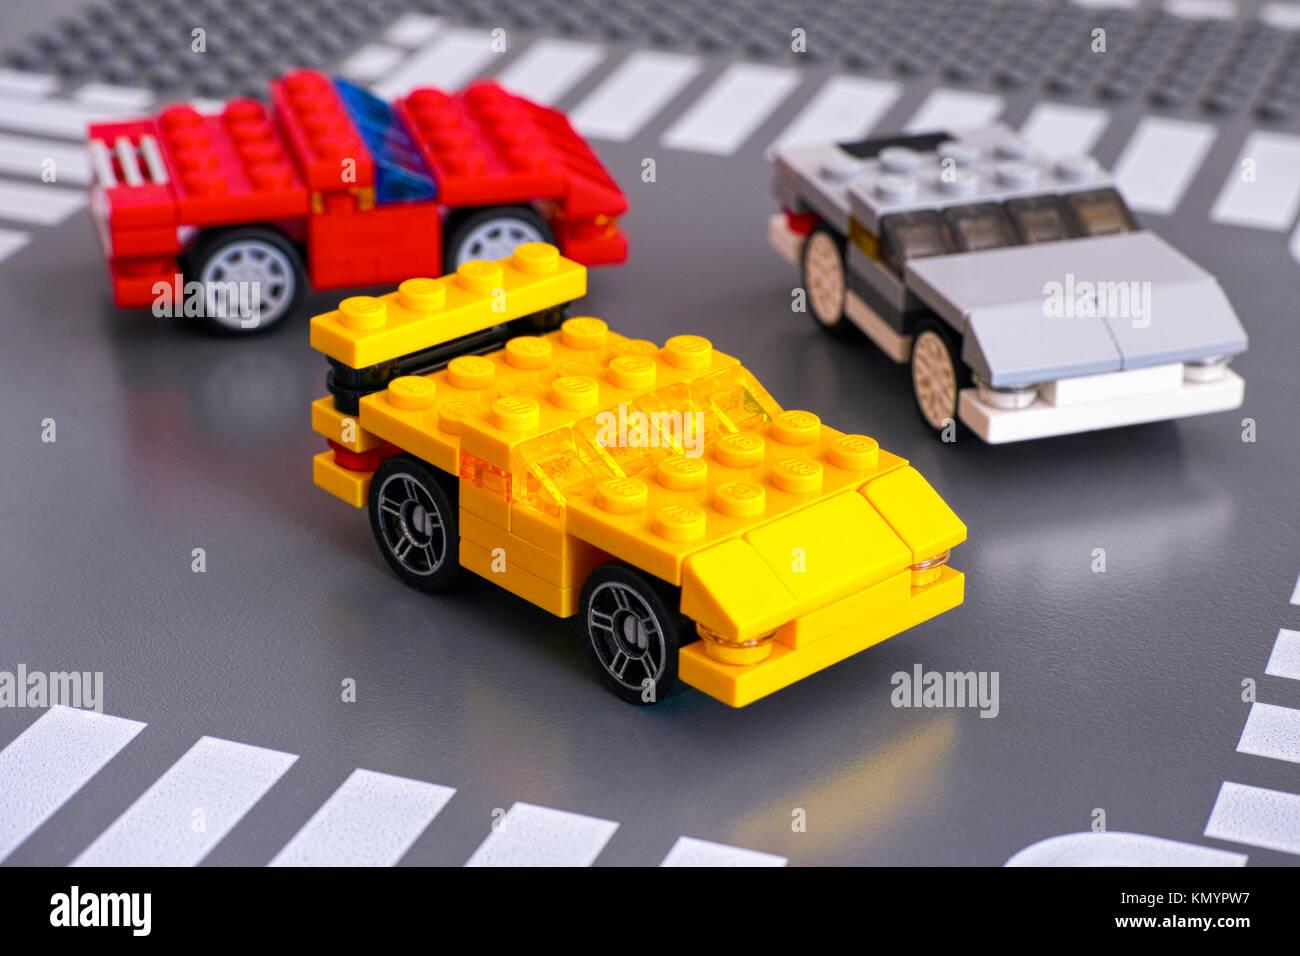 Lego Auto Stockfotos Lego Auto Bilder Alamy